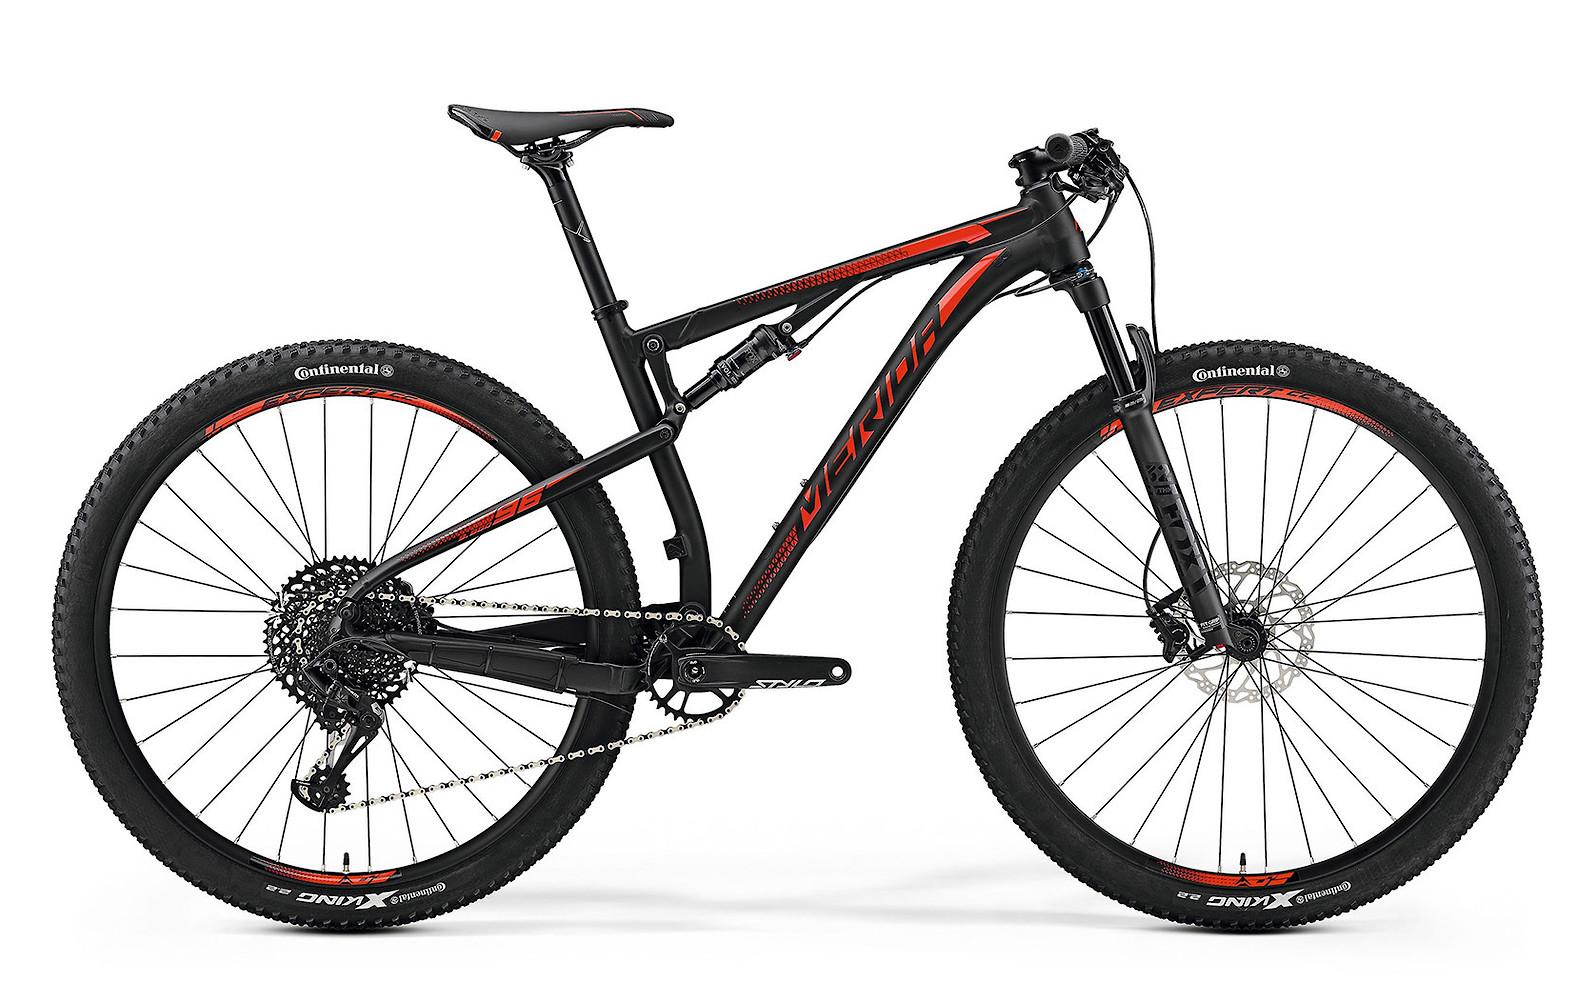 2019 Merida Ninety-Six 800 Bike